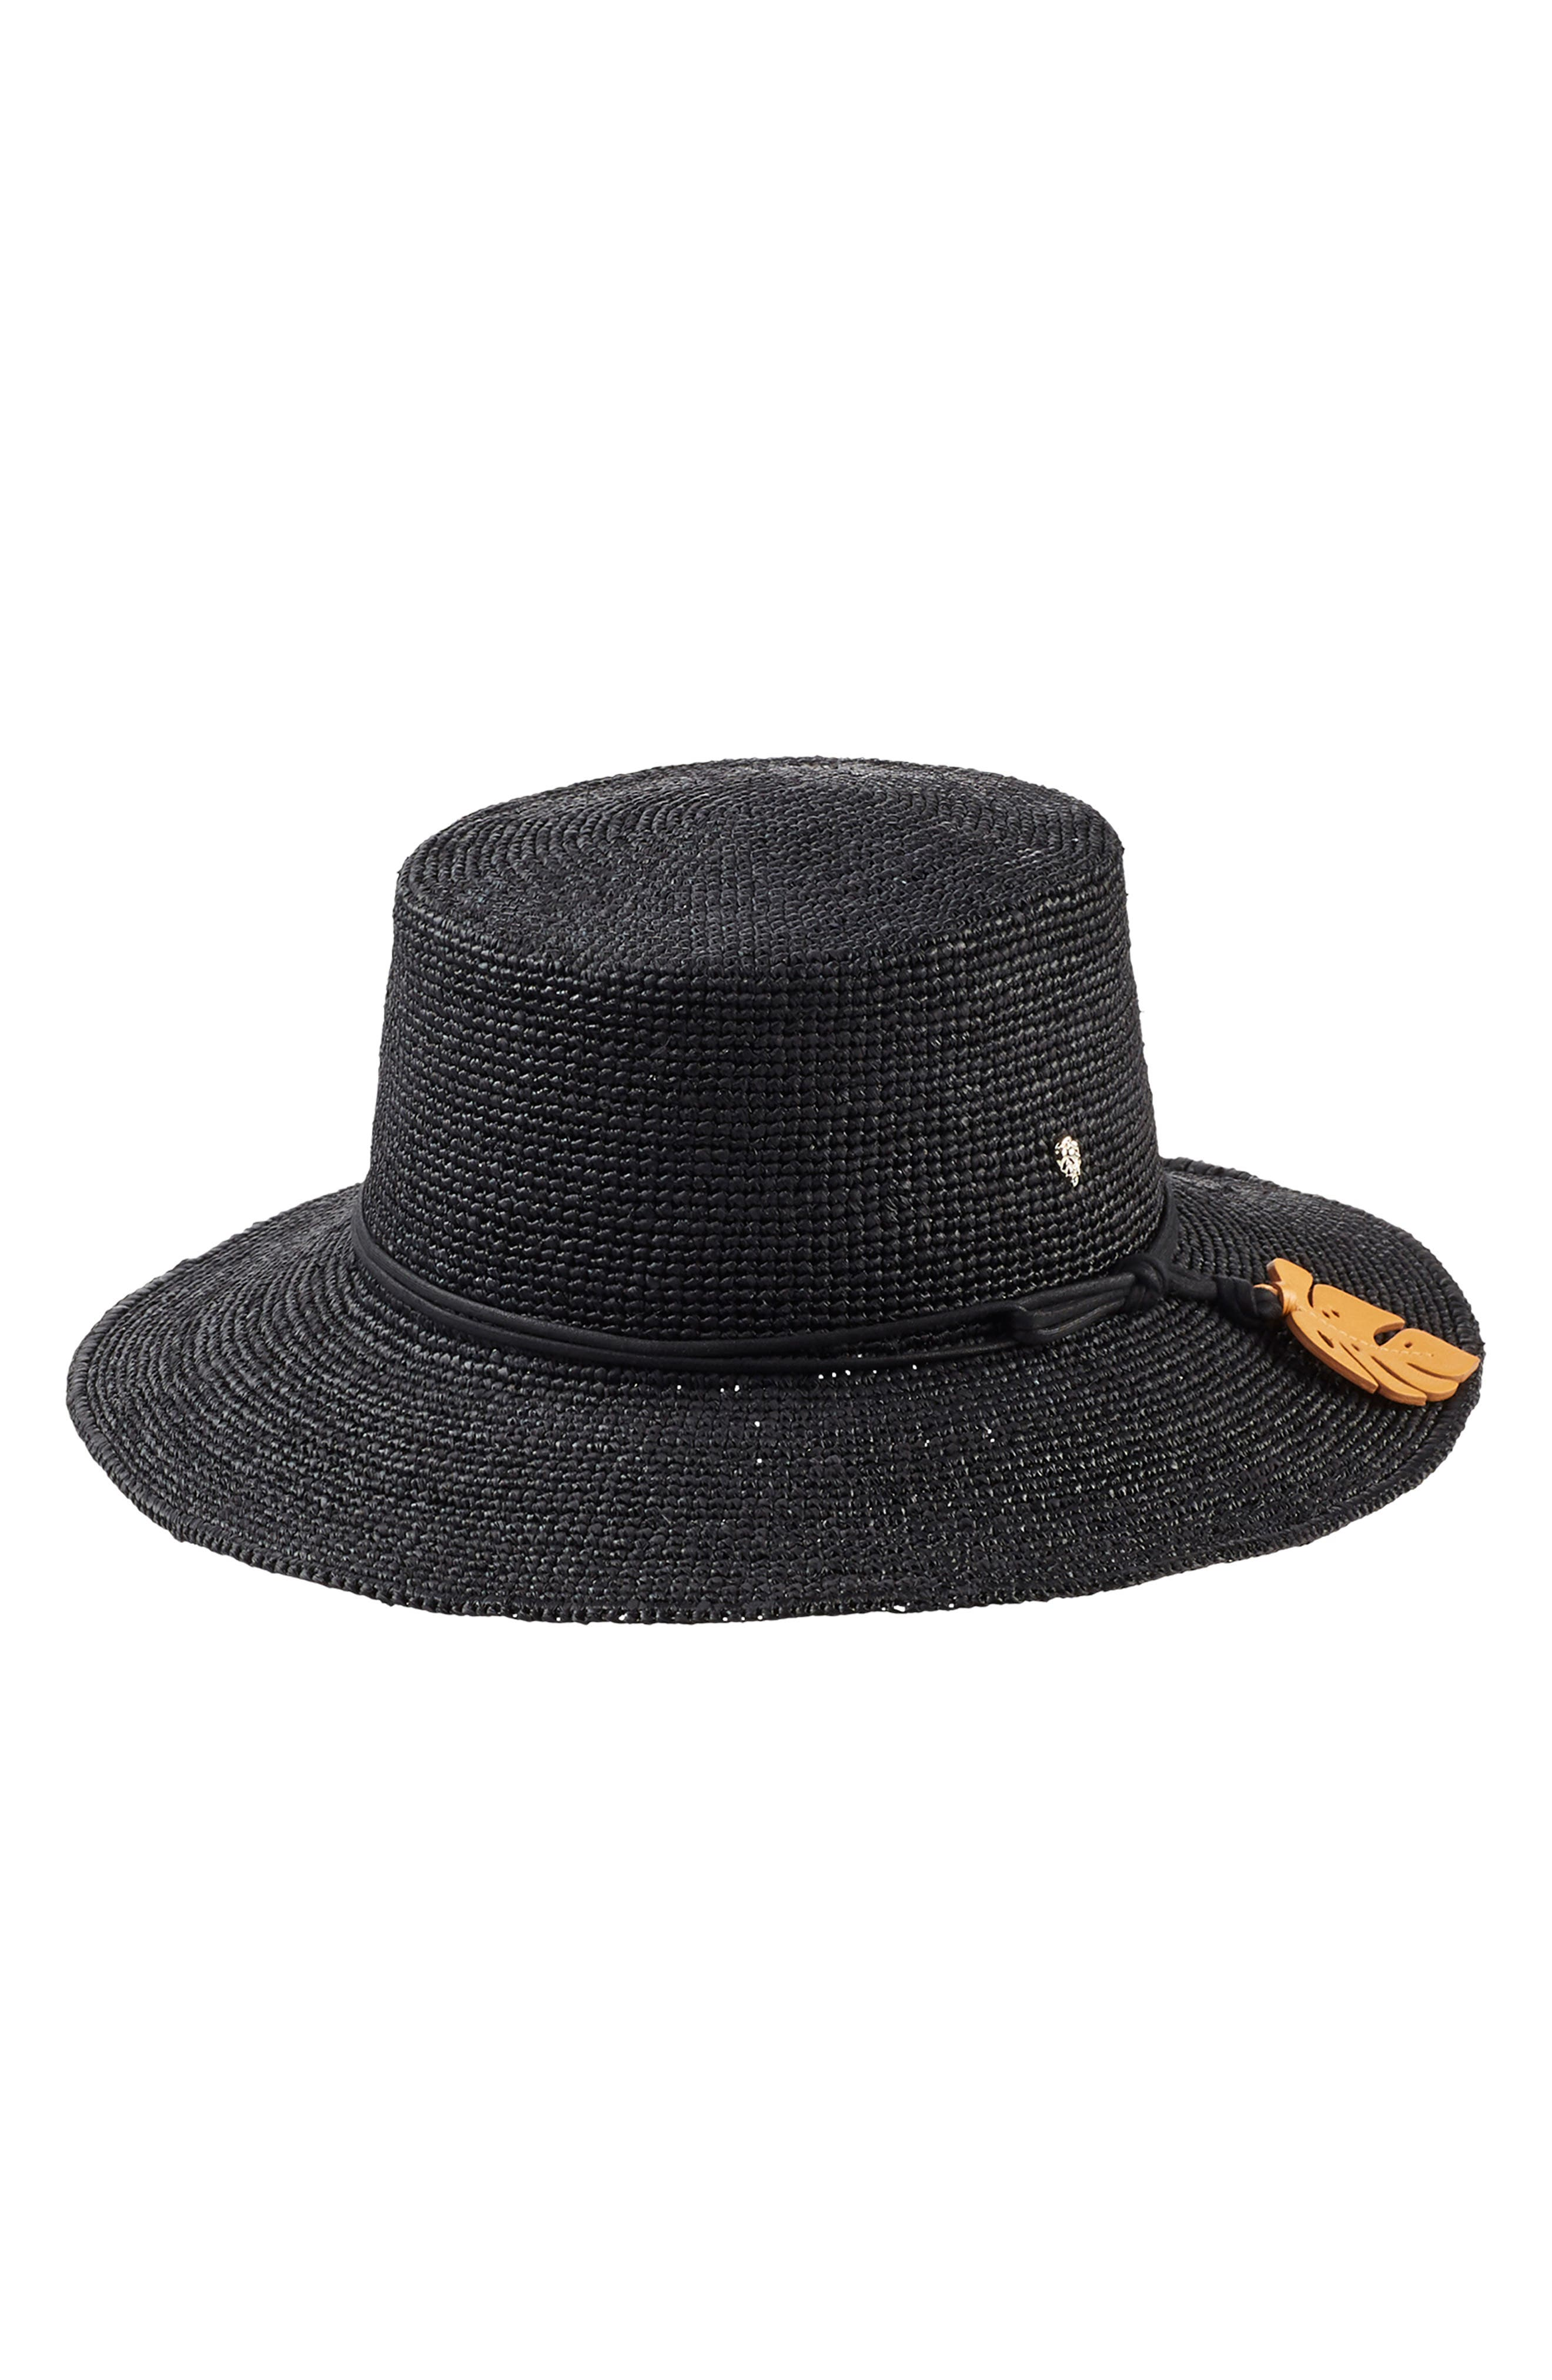 Tapered Brim Raffia Hat,                             Main thumbnail 1, color,                             CHARCOAL/ CONGO YELLOW